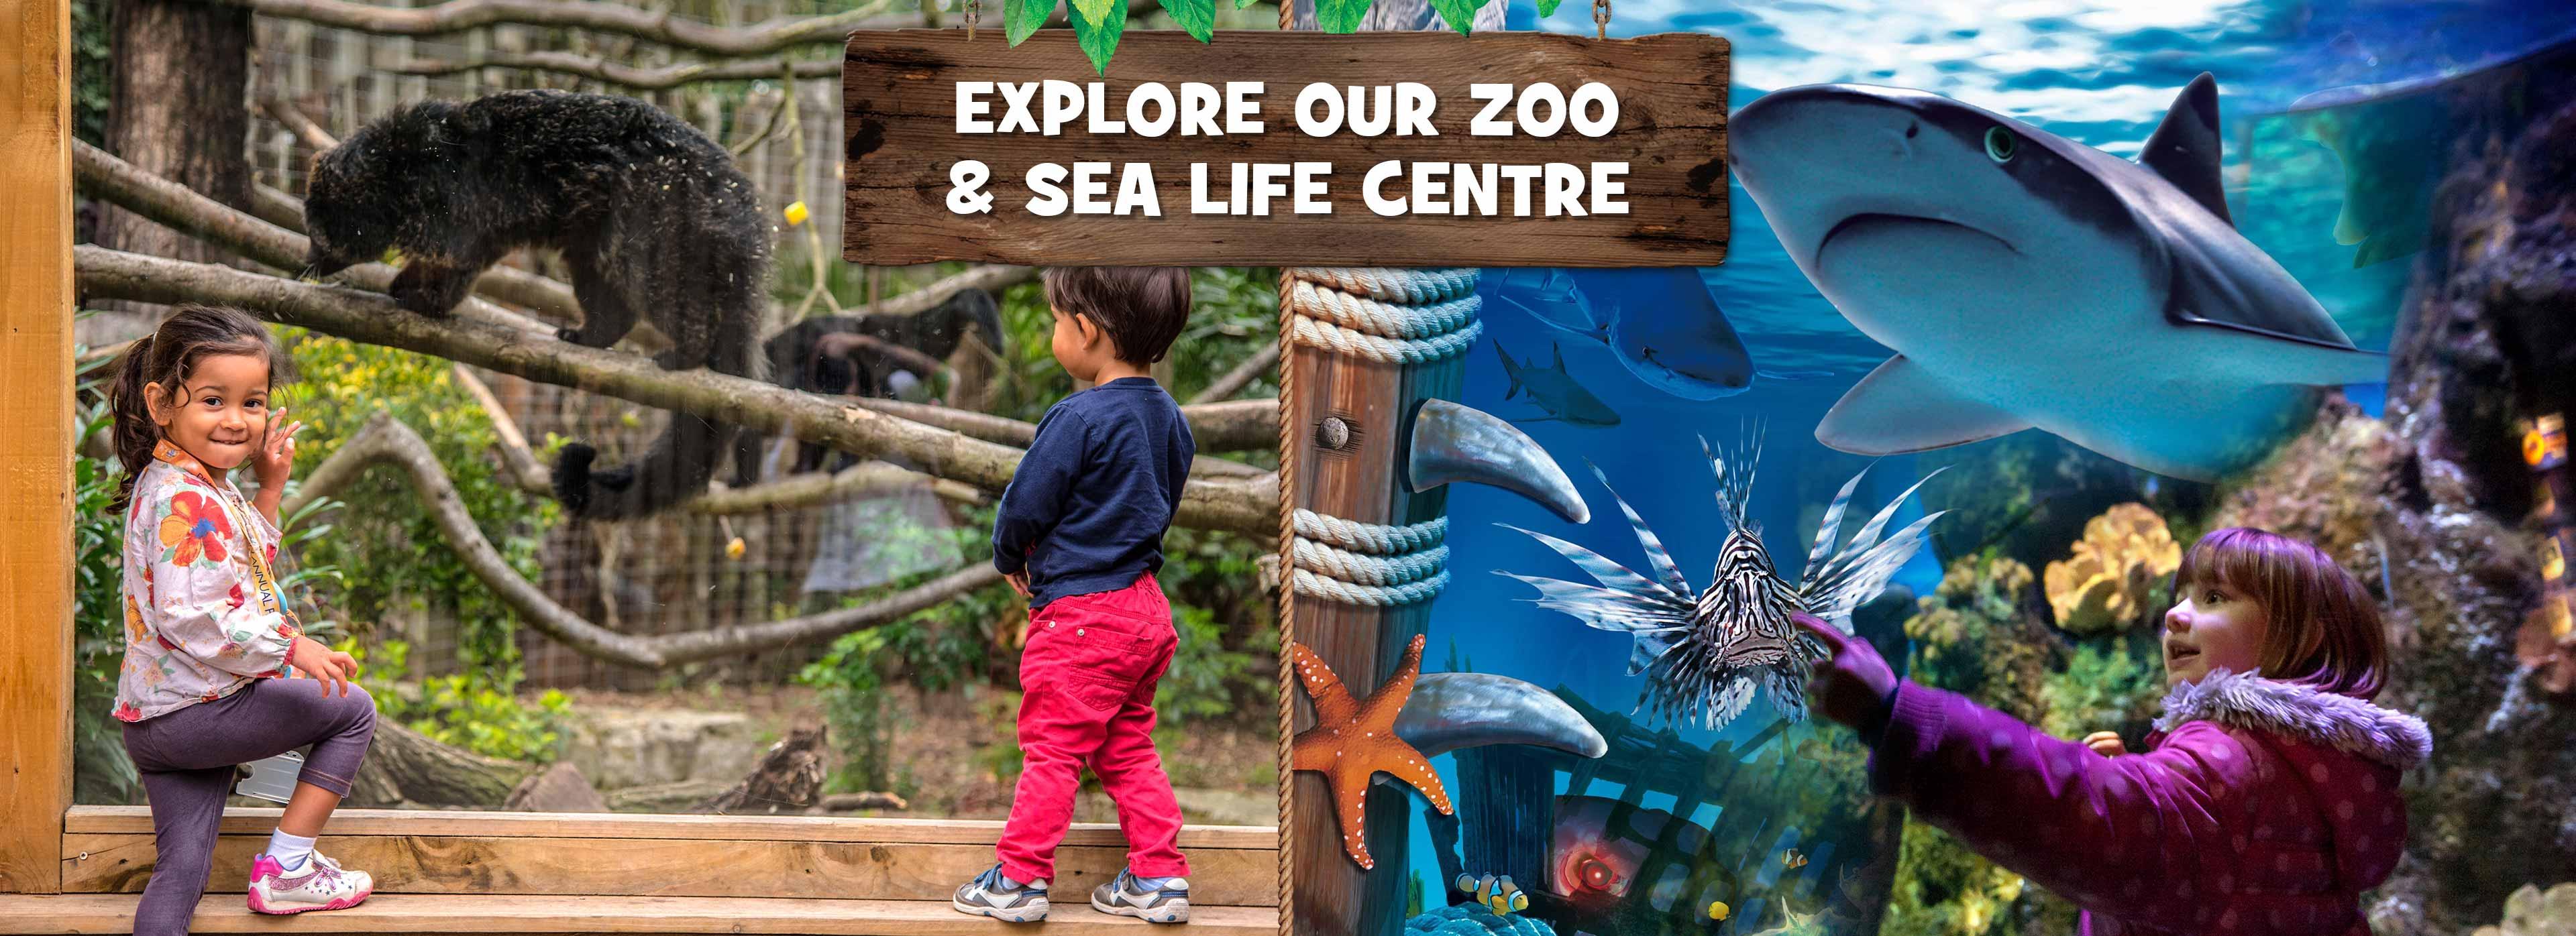 Chessington Zoo and SEA LIFE centre